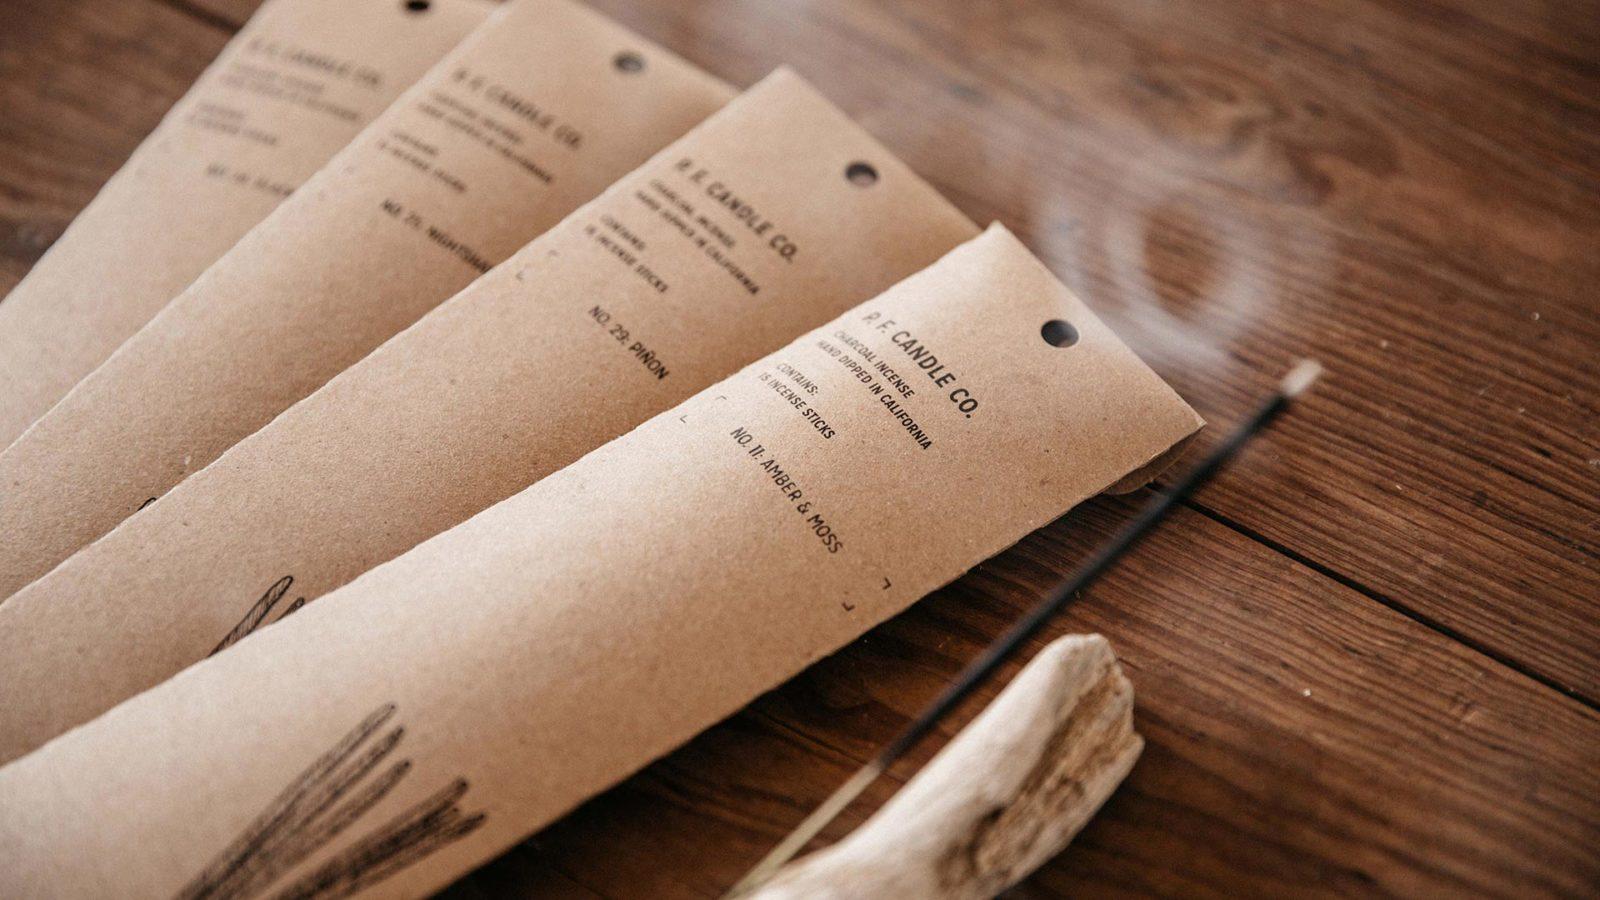 PF scented incense sticks